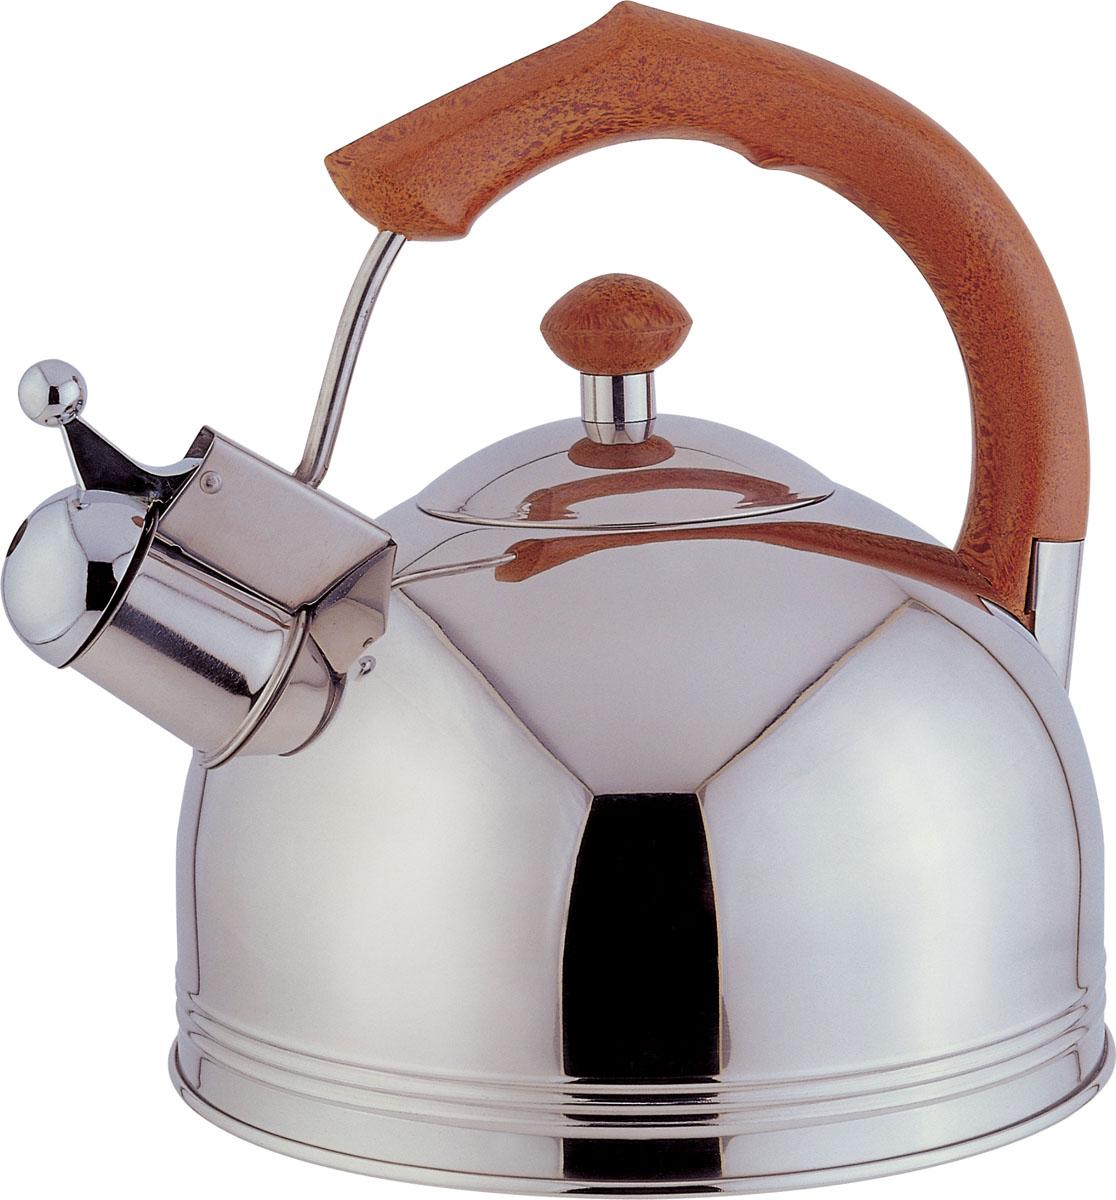 Чайник Bekker Koch со свистком, 3 л. BK-S317 кеды nautica